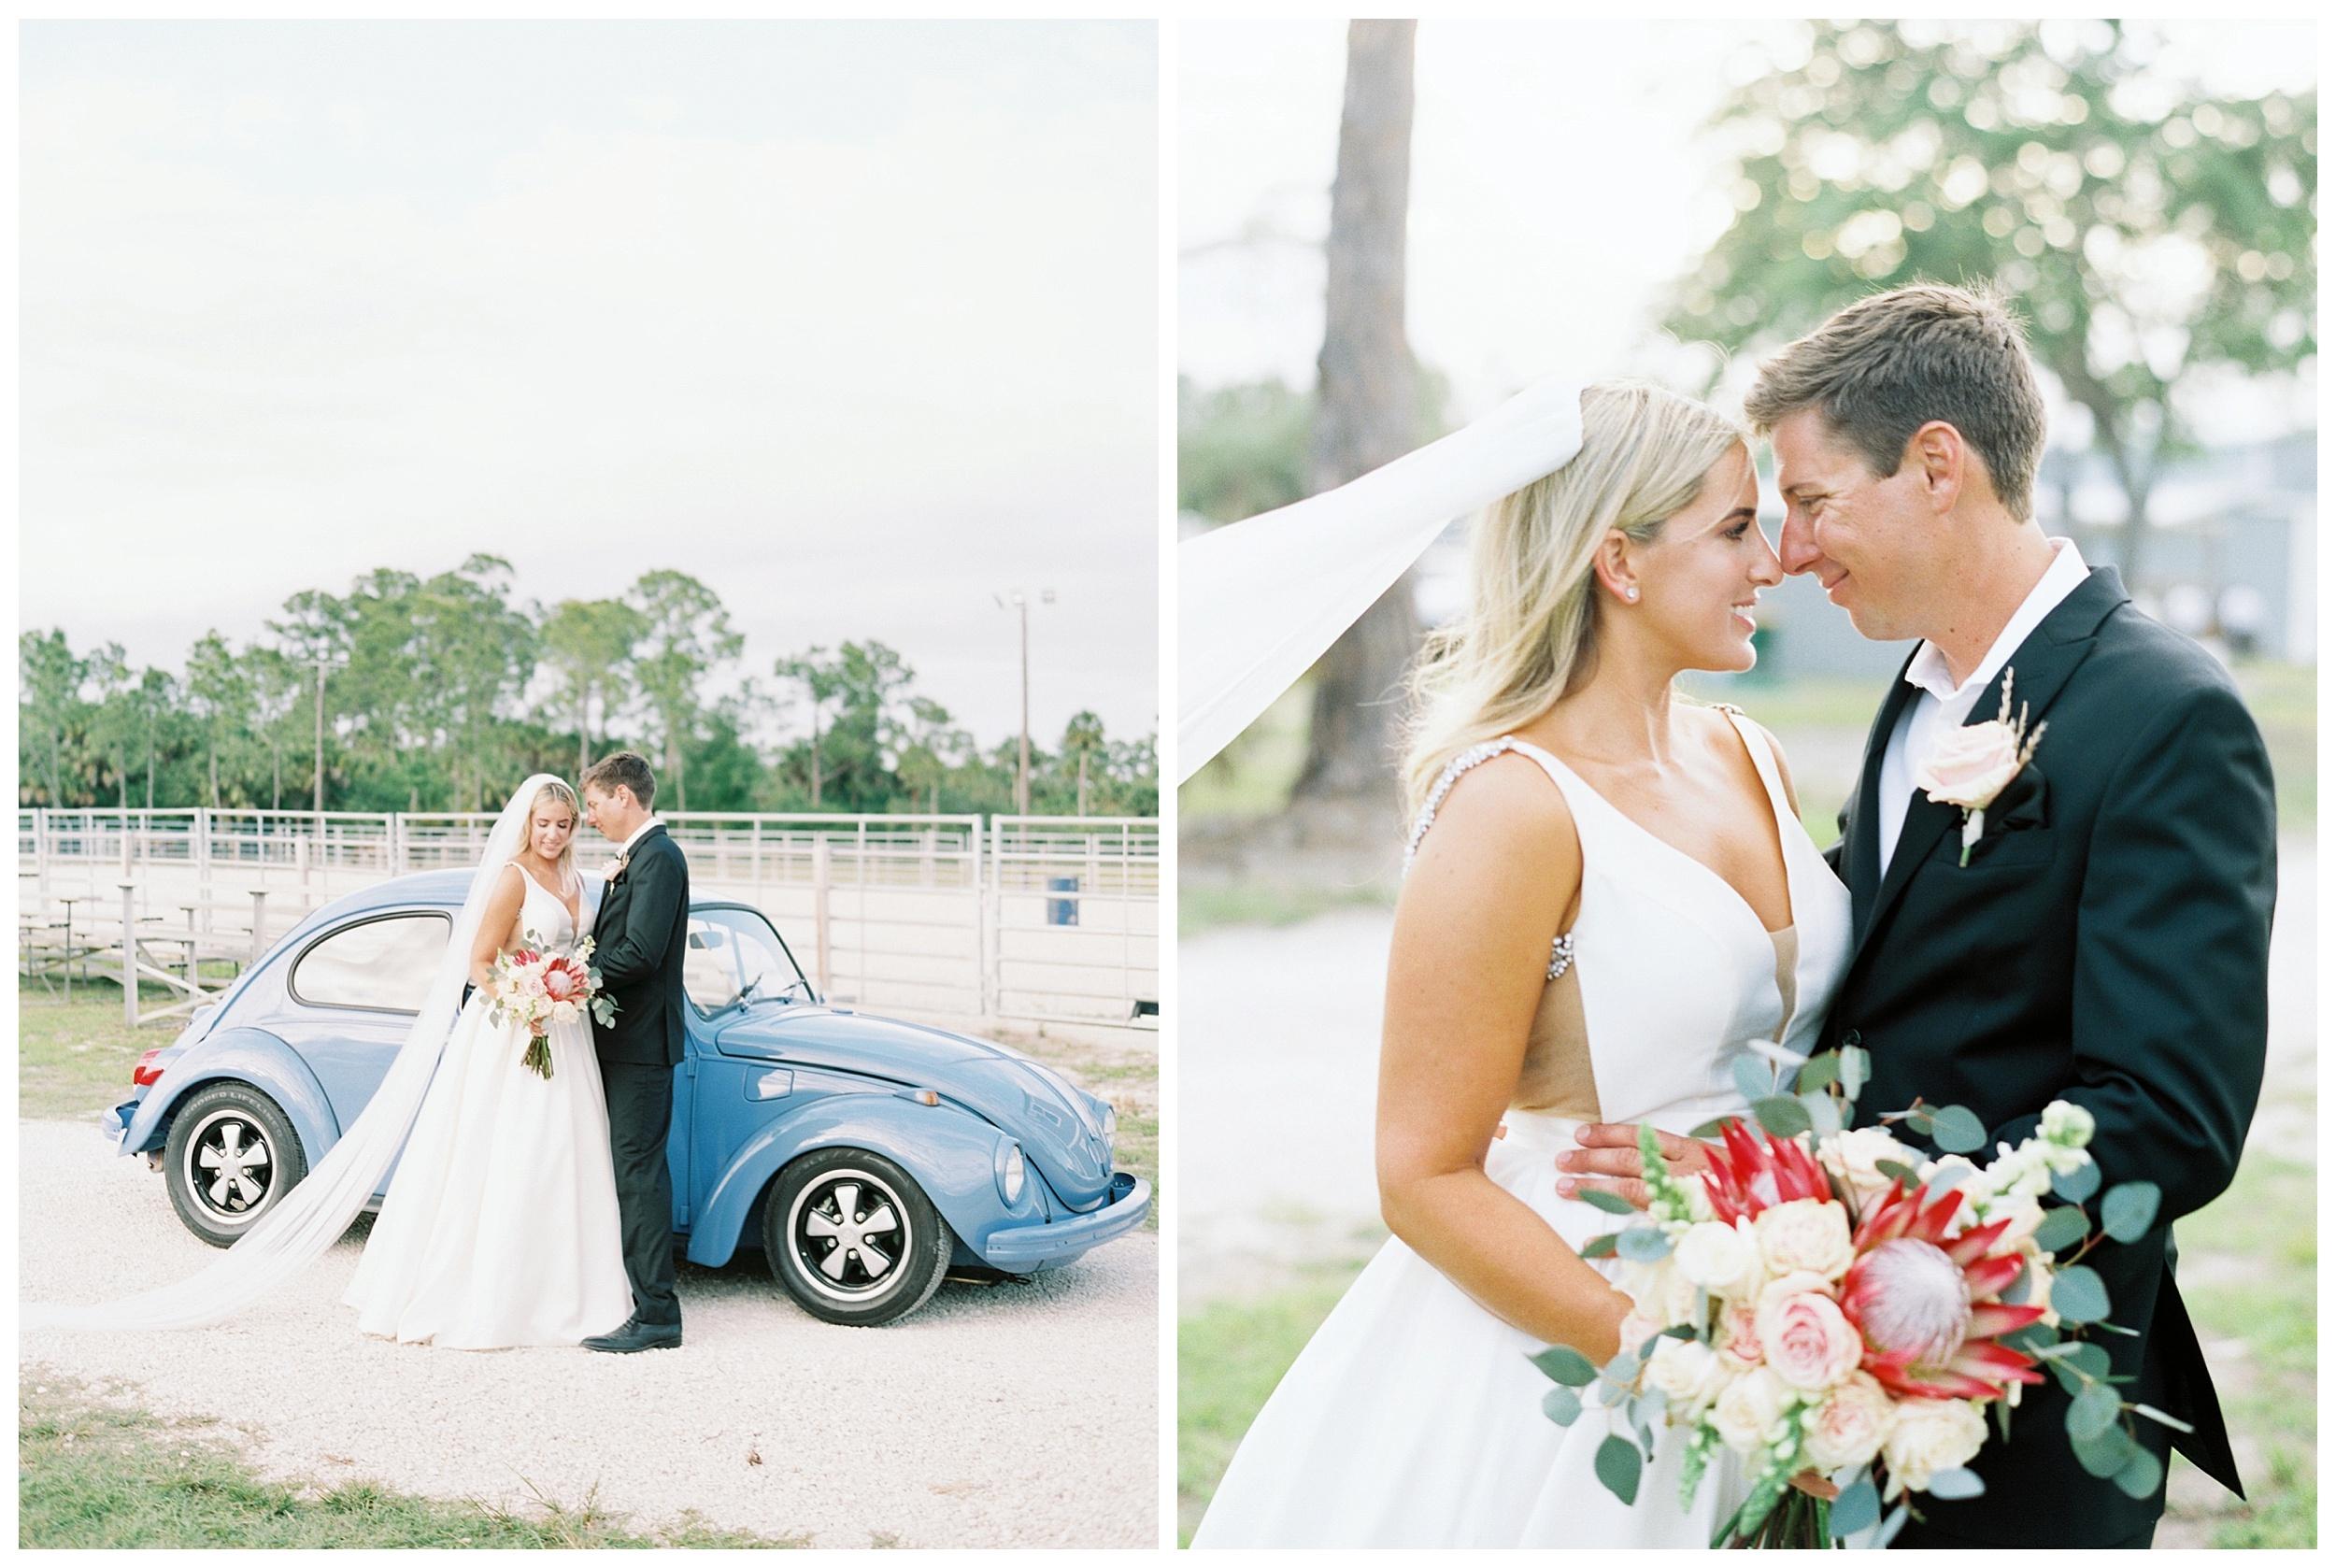 South Florida Wedding Photographer Kir Tuben_0091.jpg